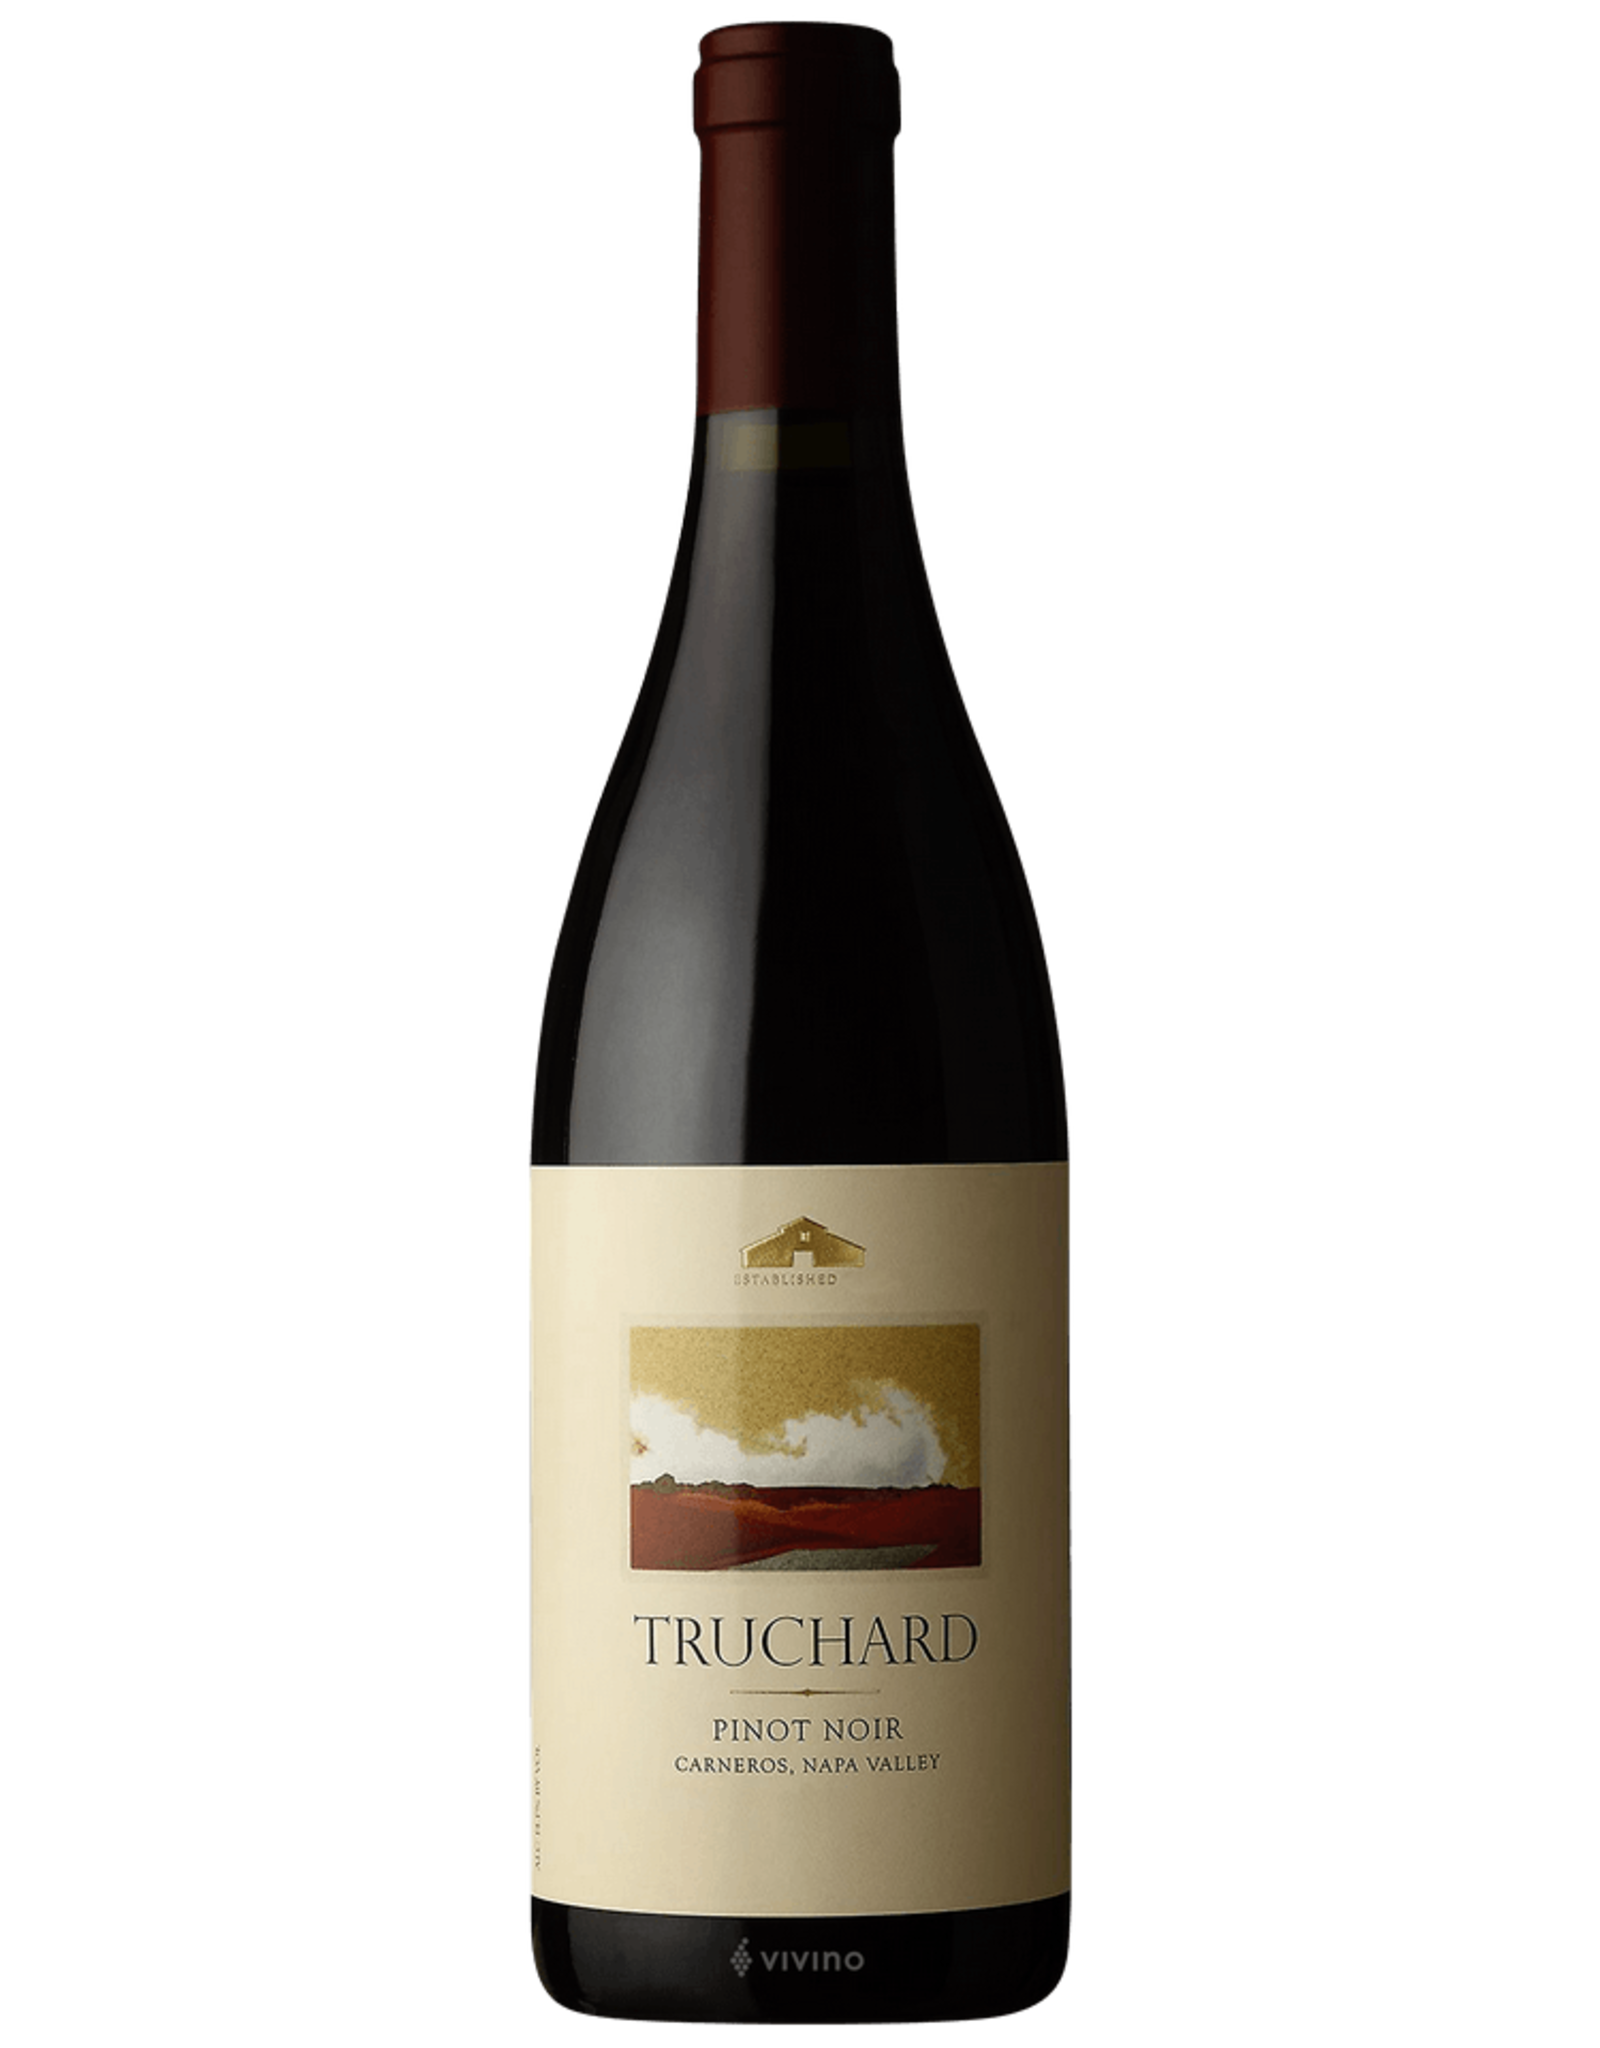 Truchard Pinot Noir 2017